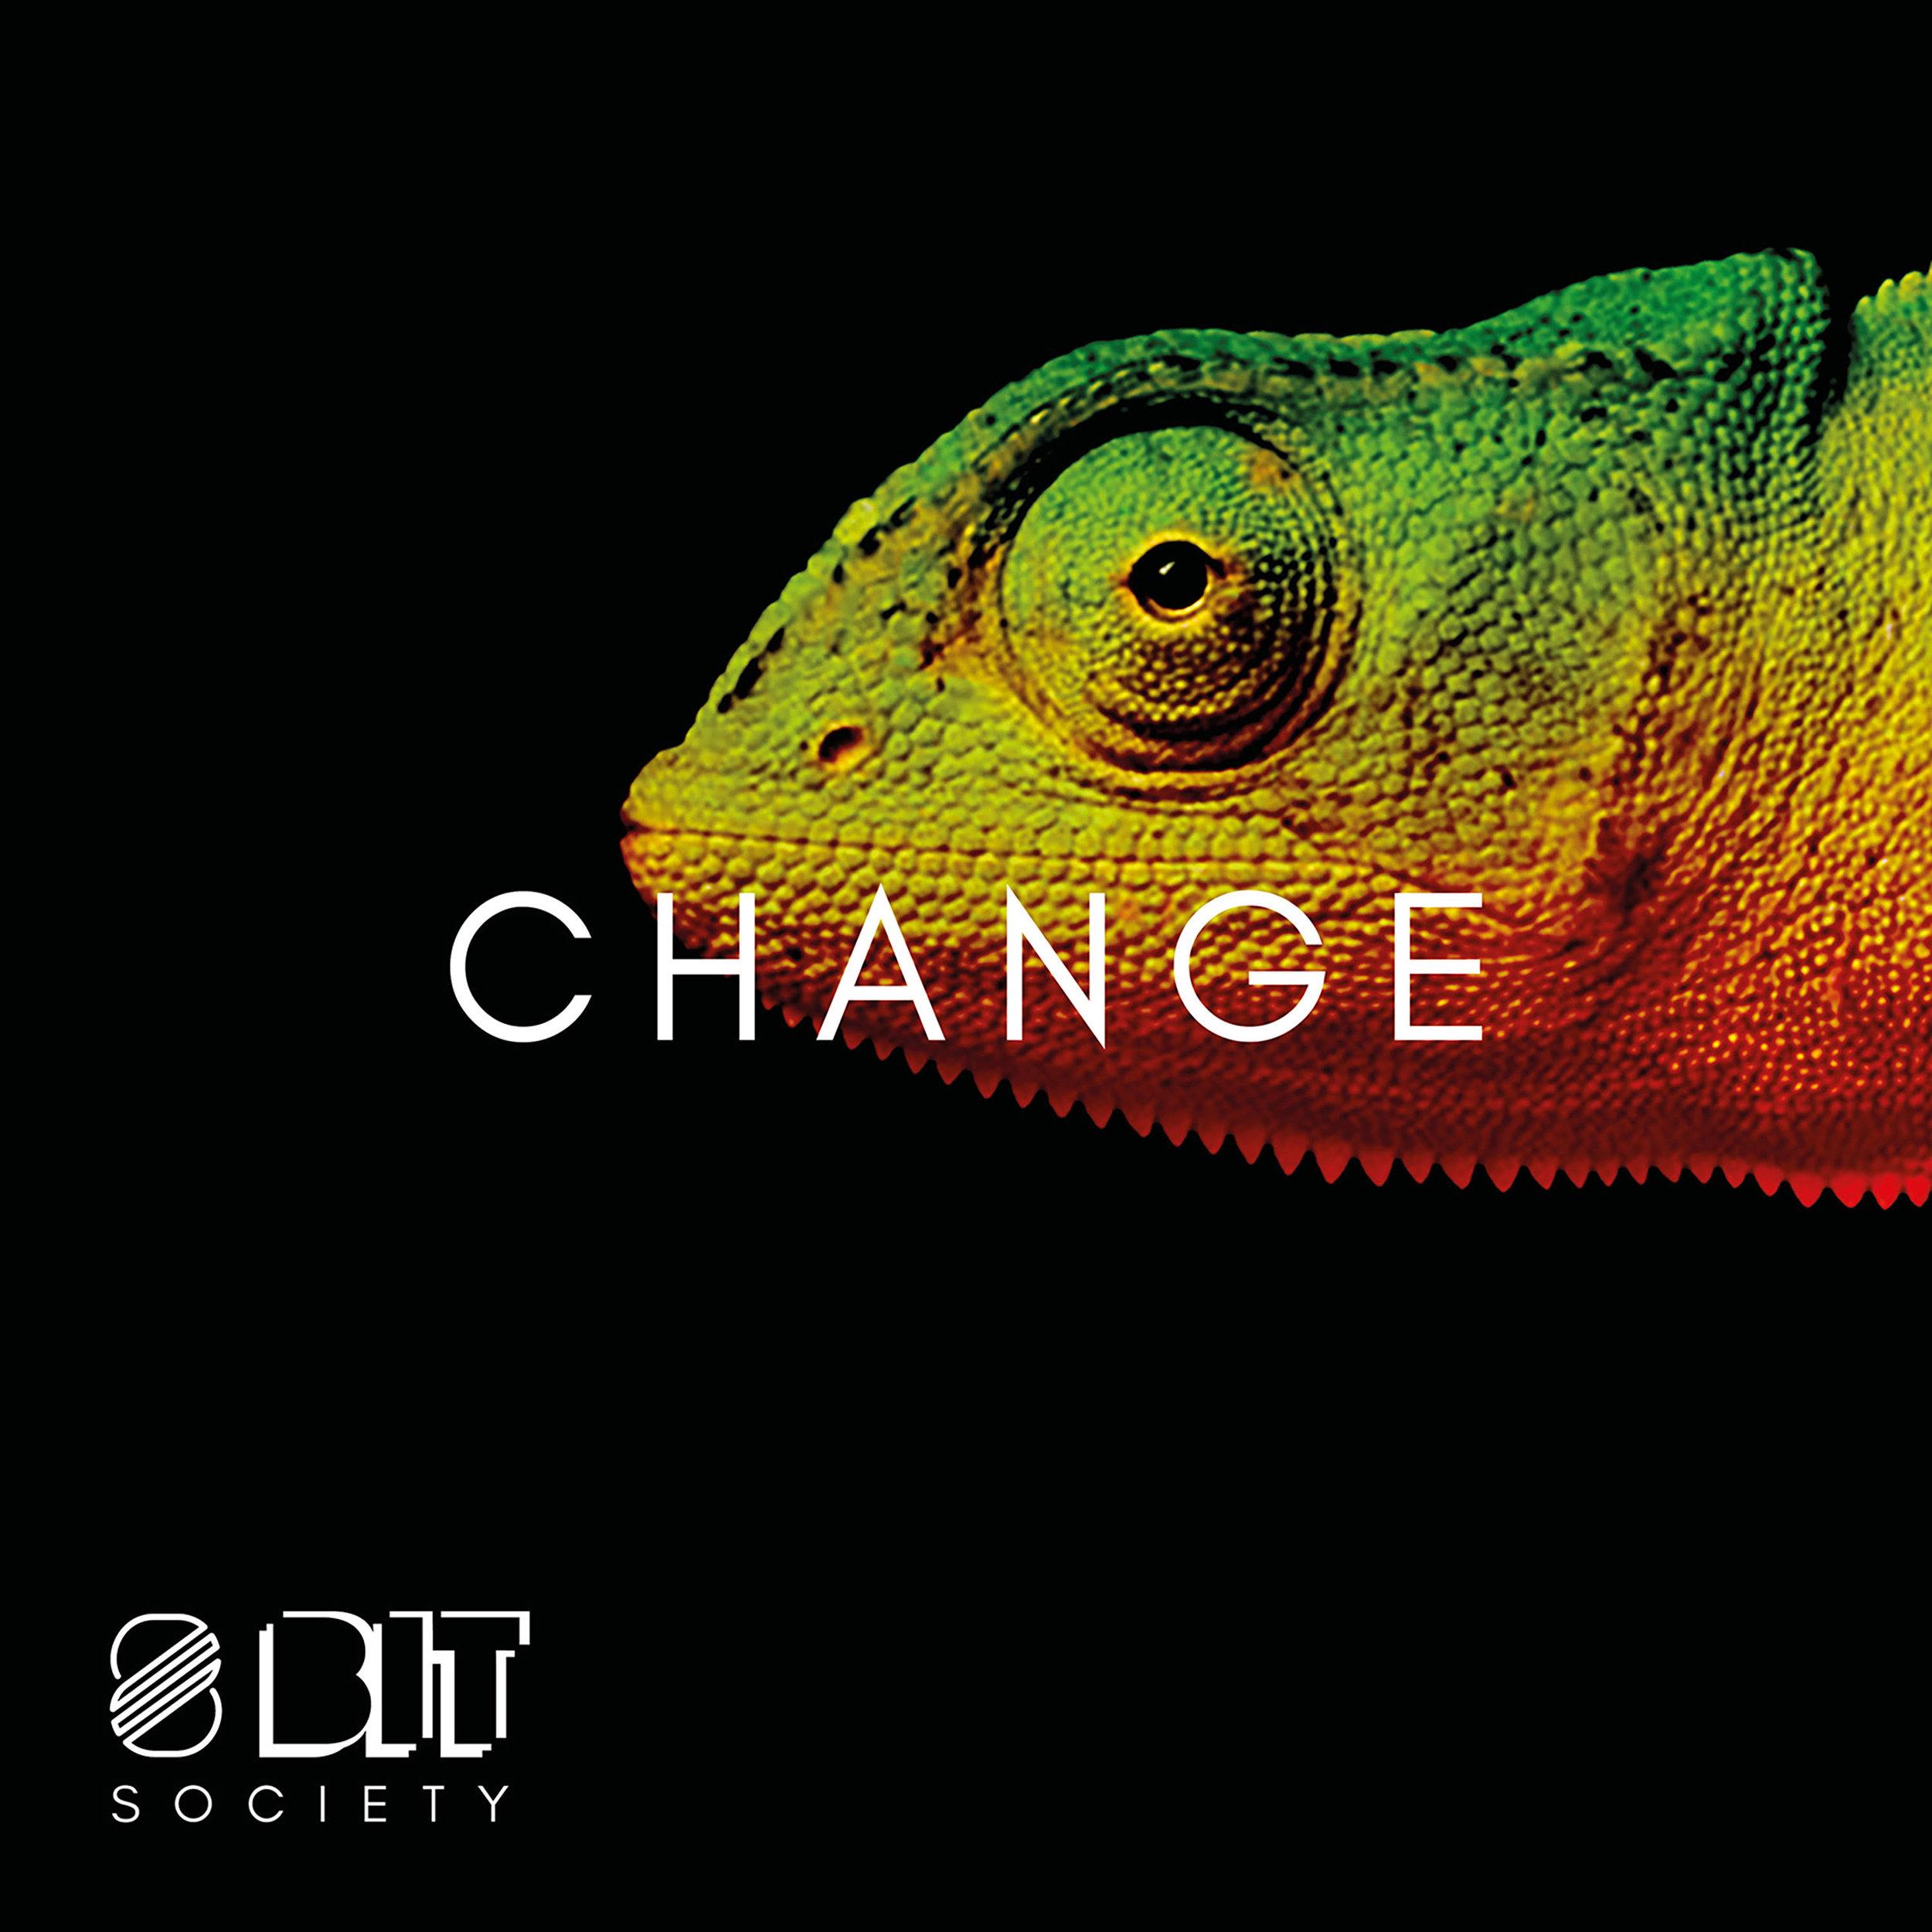 8 Bit Society_Change.jpg